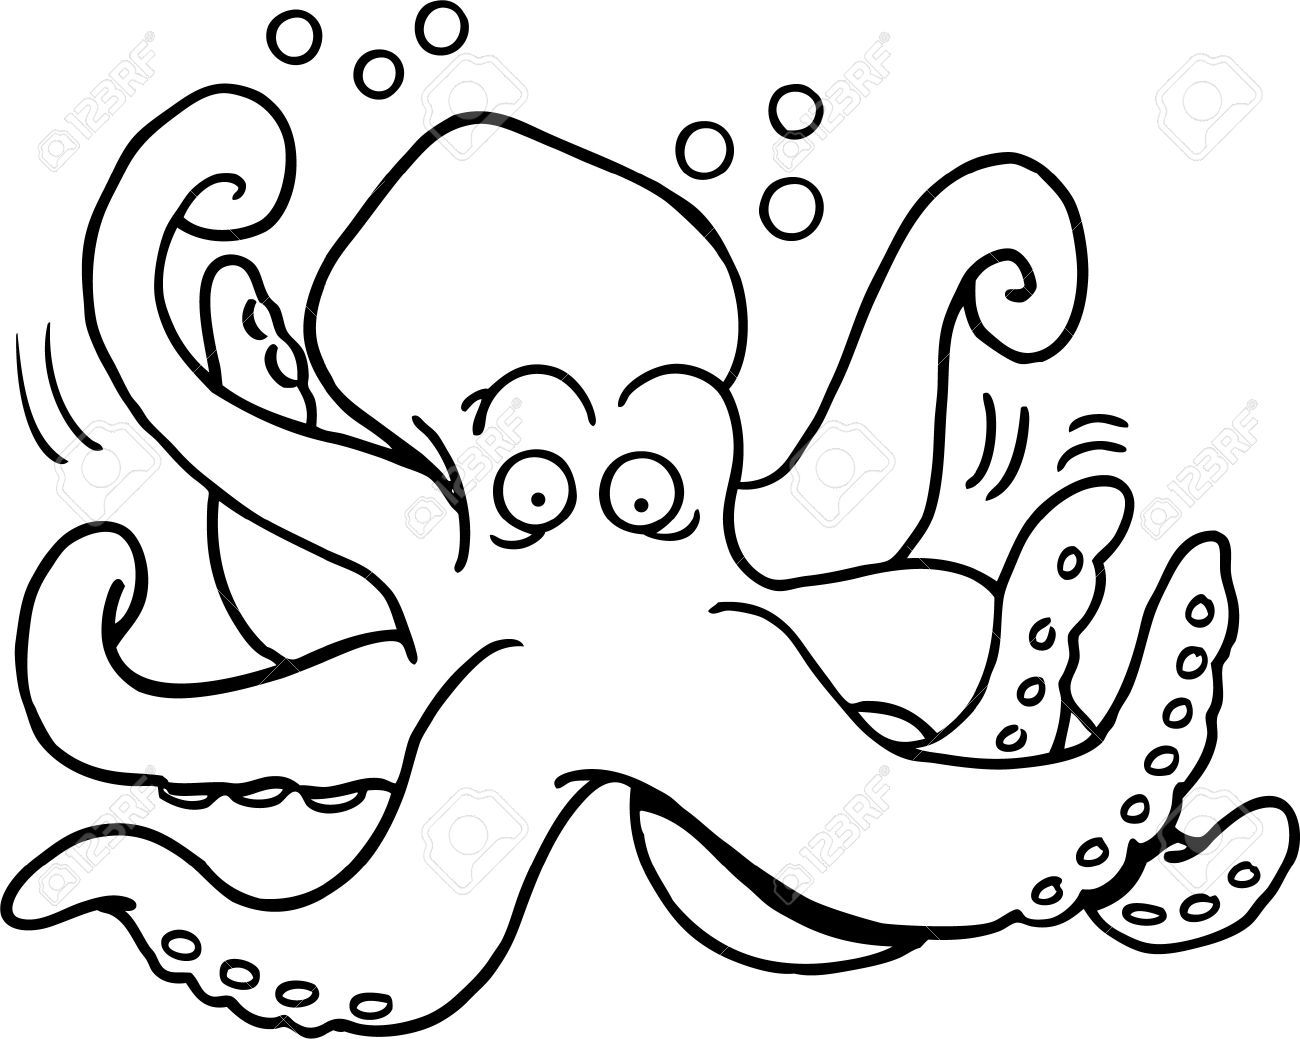 Under the sea clipart black and white clip royalty free Under the sea clipart black and white 8 » Clipart Portal clip royalty free